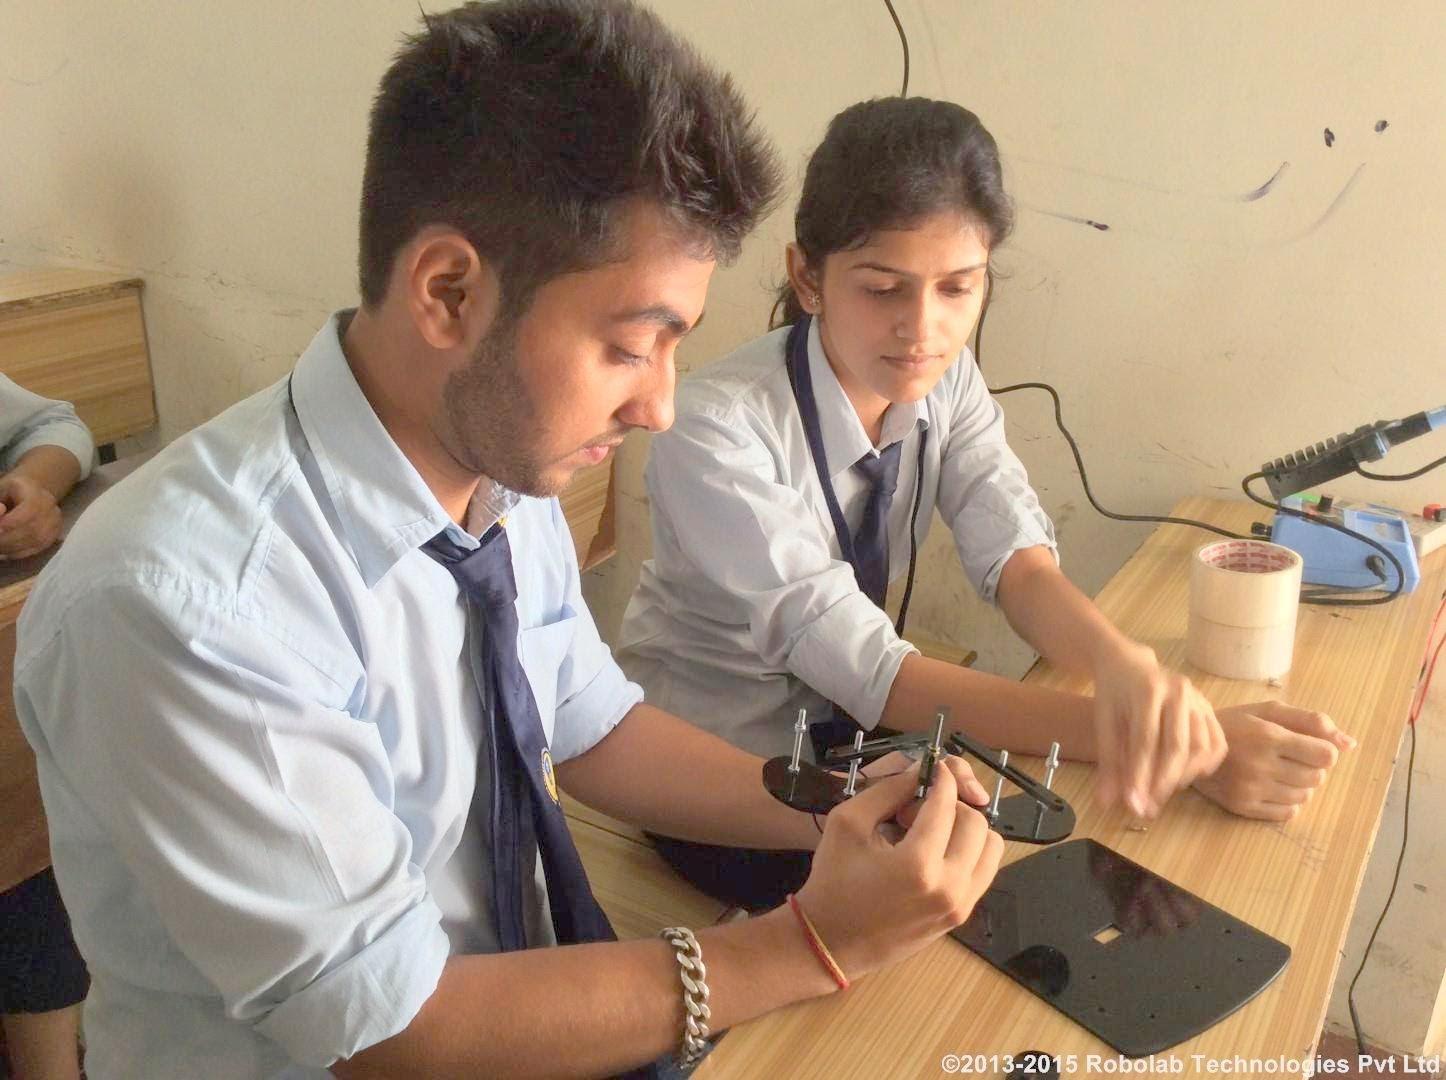 Amritsar College Of Engineering and Technology, Amritsar Robolab 15 (23).jpg